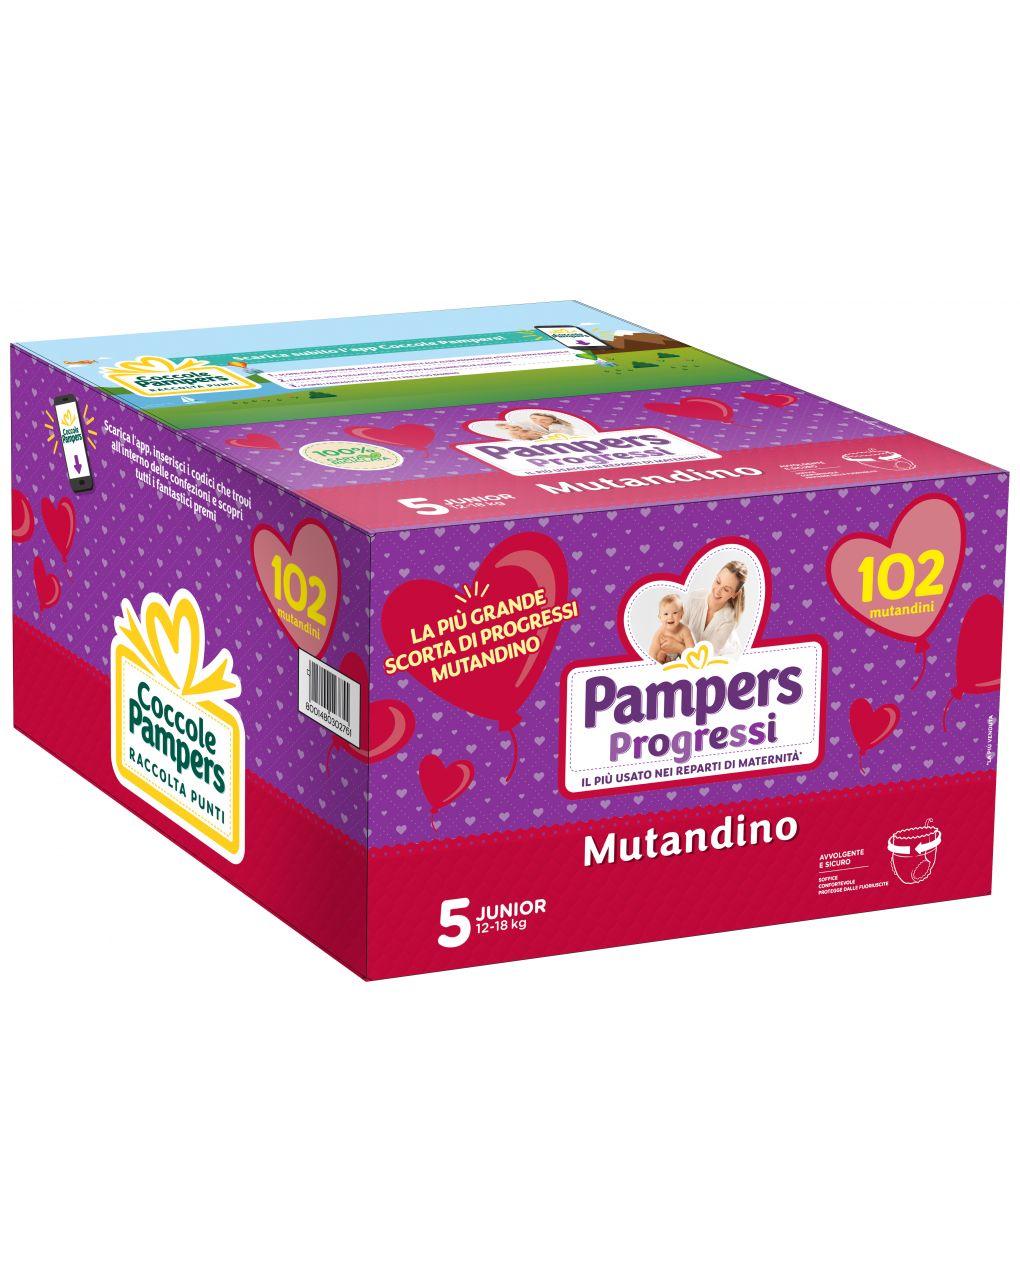 Pampers - pannolini progressi mutandino esapack tg. 5 (102 pz) - Pampers